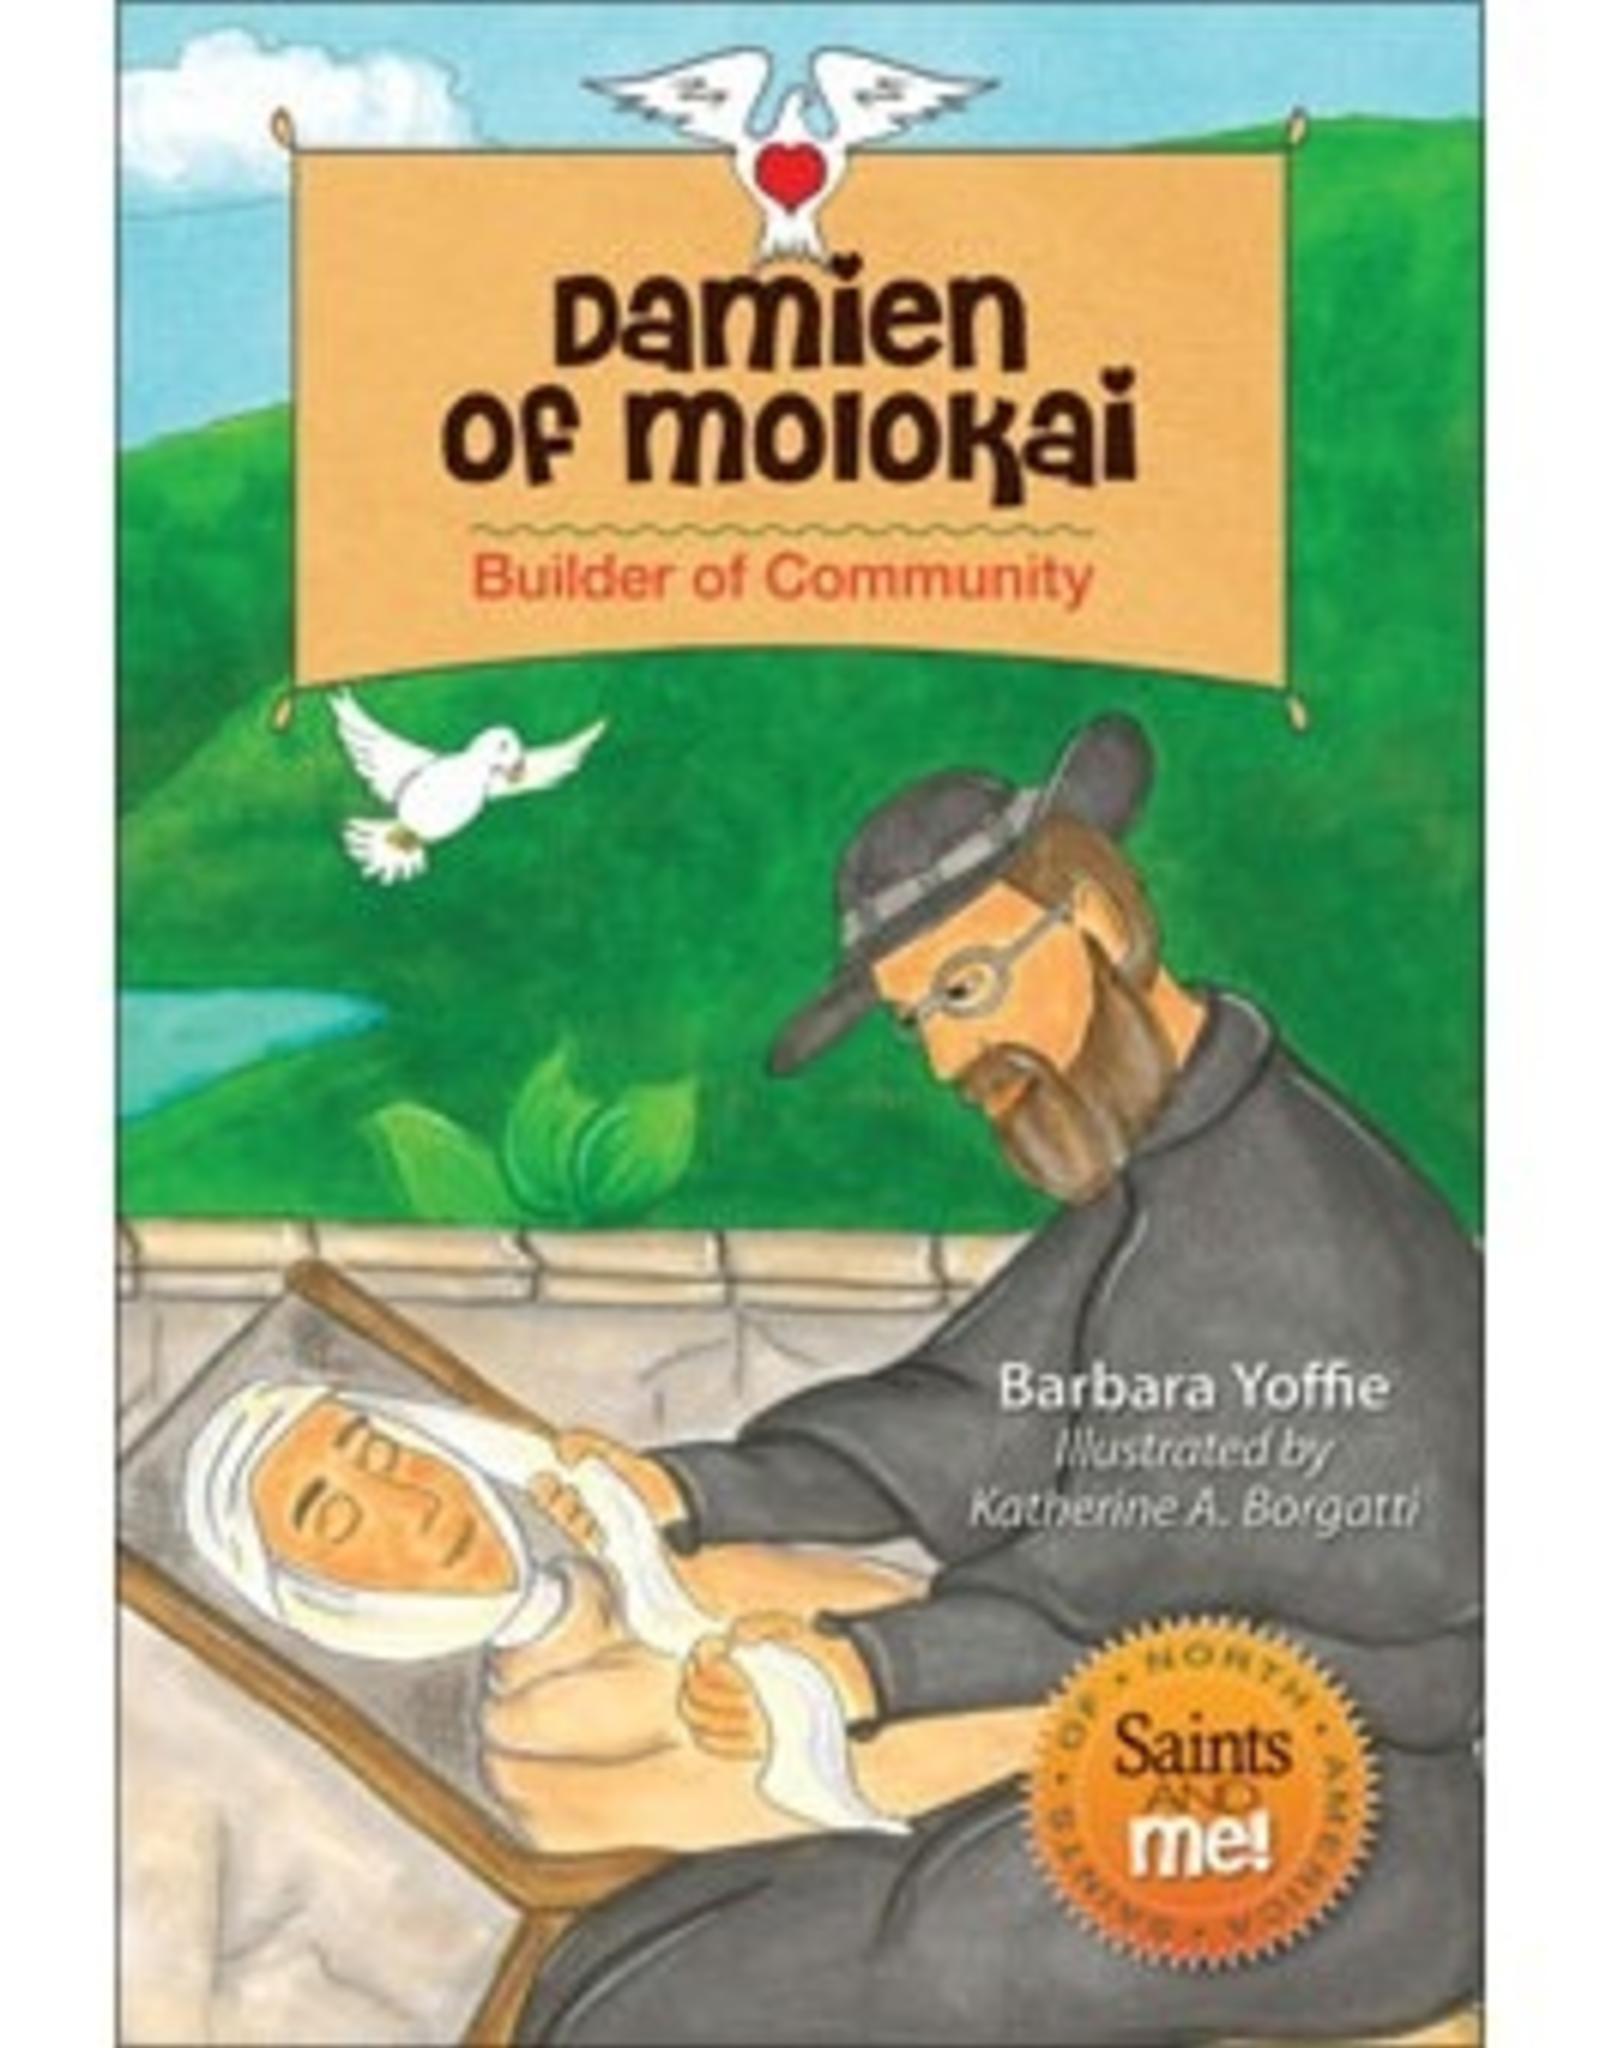 Liguori Damien of Molokai:  Builder of Community, by Barbara Yoffie, Illustrated by Katherine Borgatti (paperback)